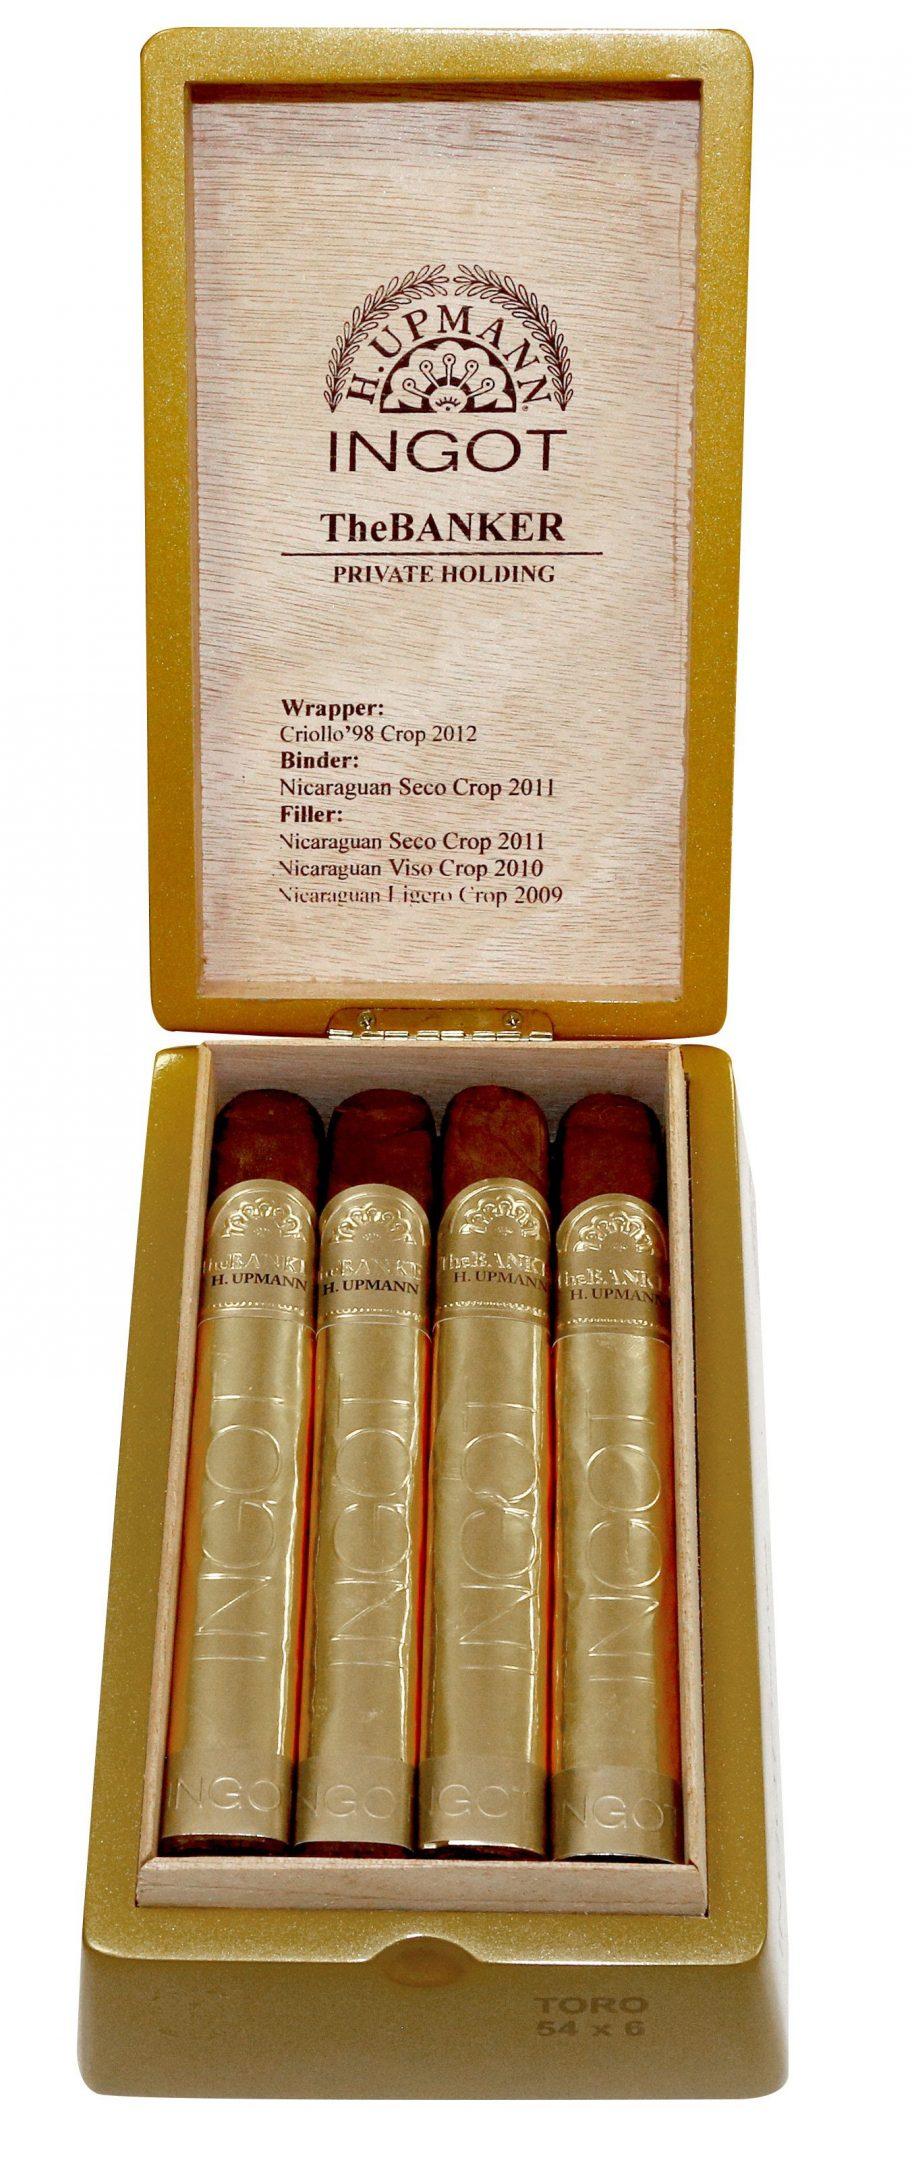 Cigar News: Altadis Announces Limited H. Upmann The Banker Private Holding Ingot